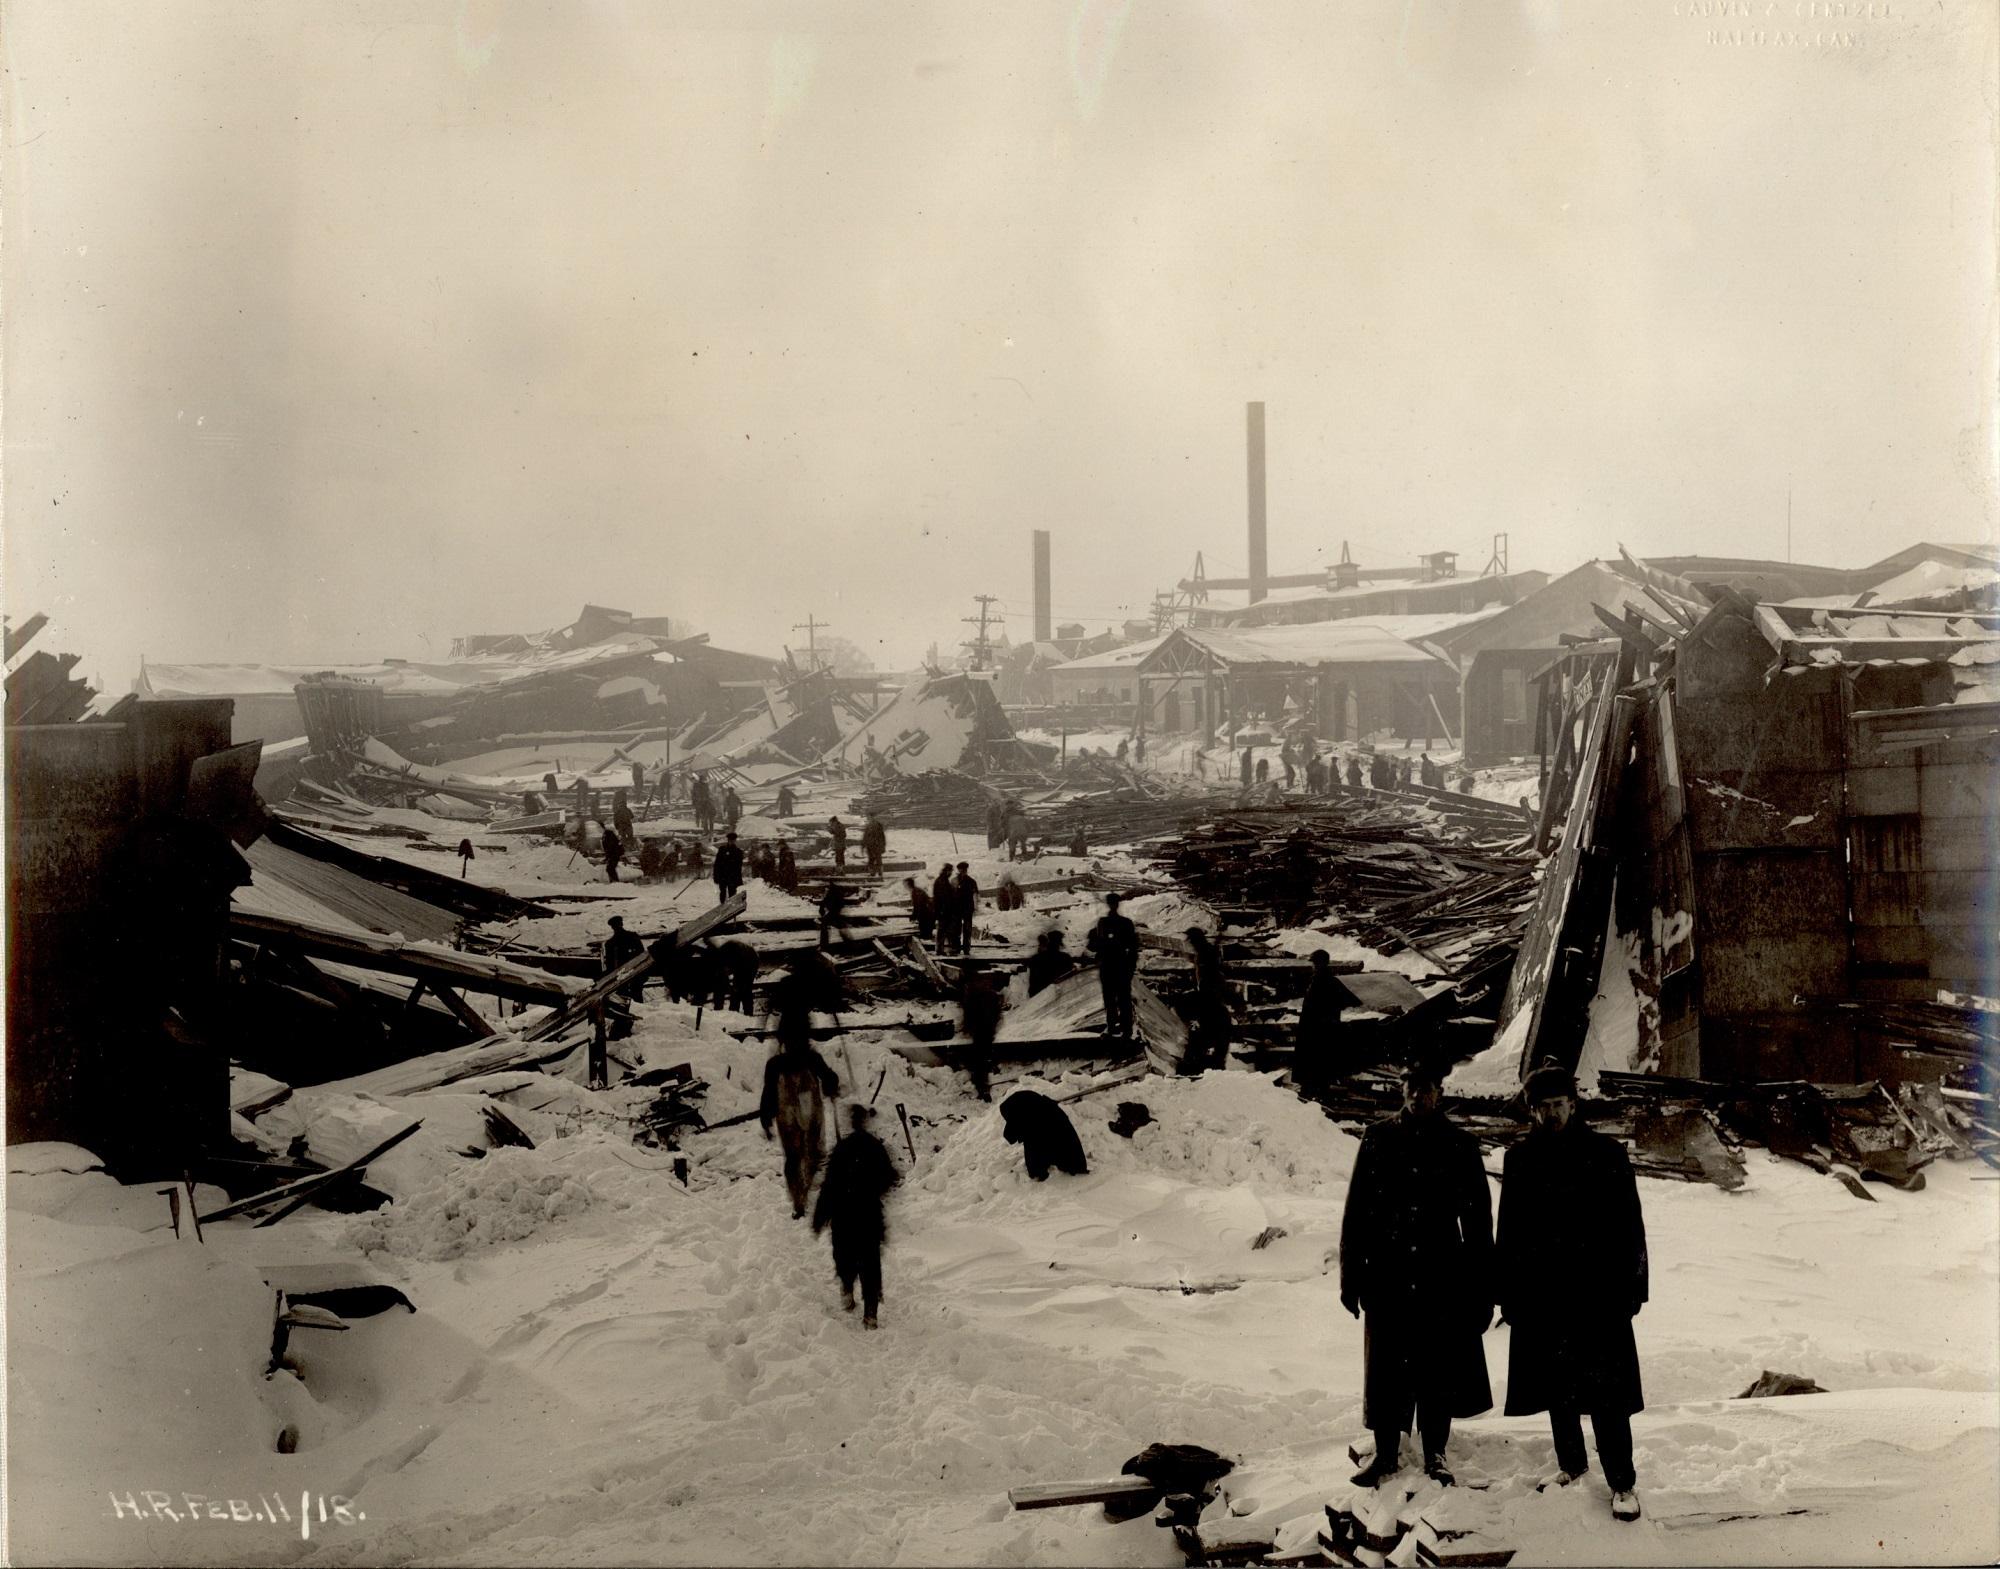 Halifax, N.S.: Ruins of car erecting shed.